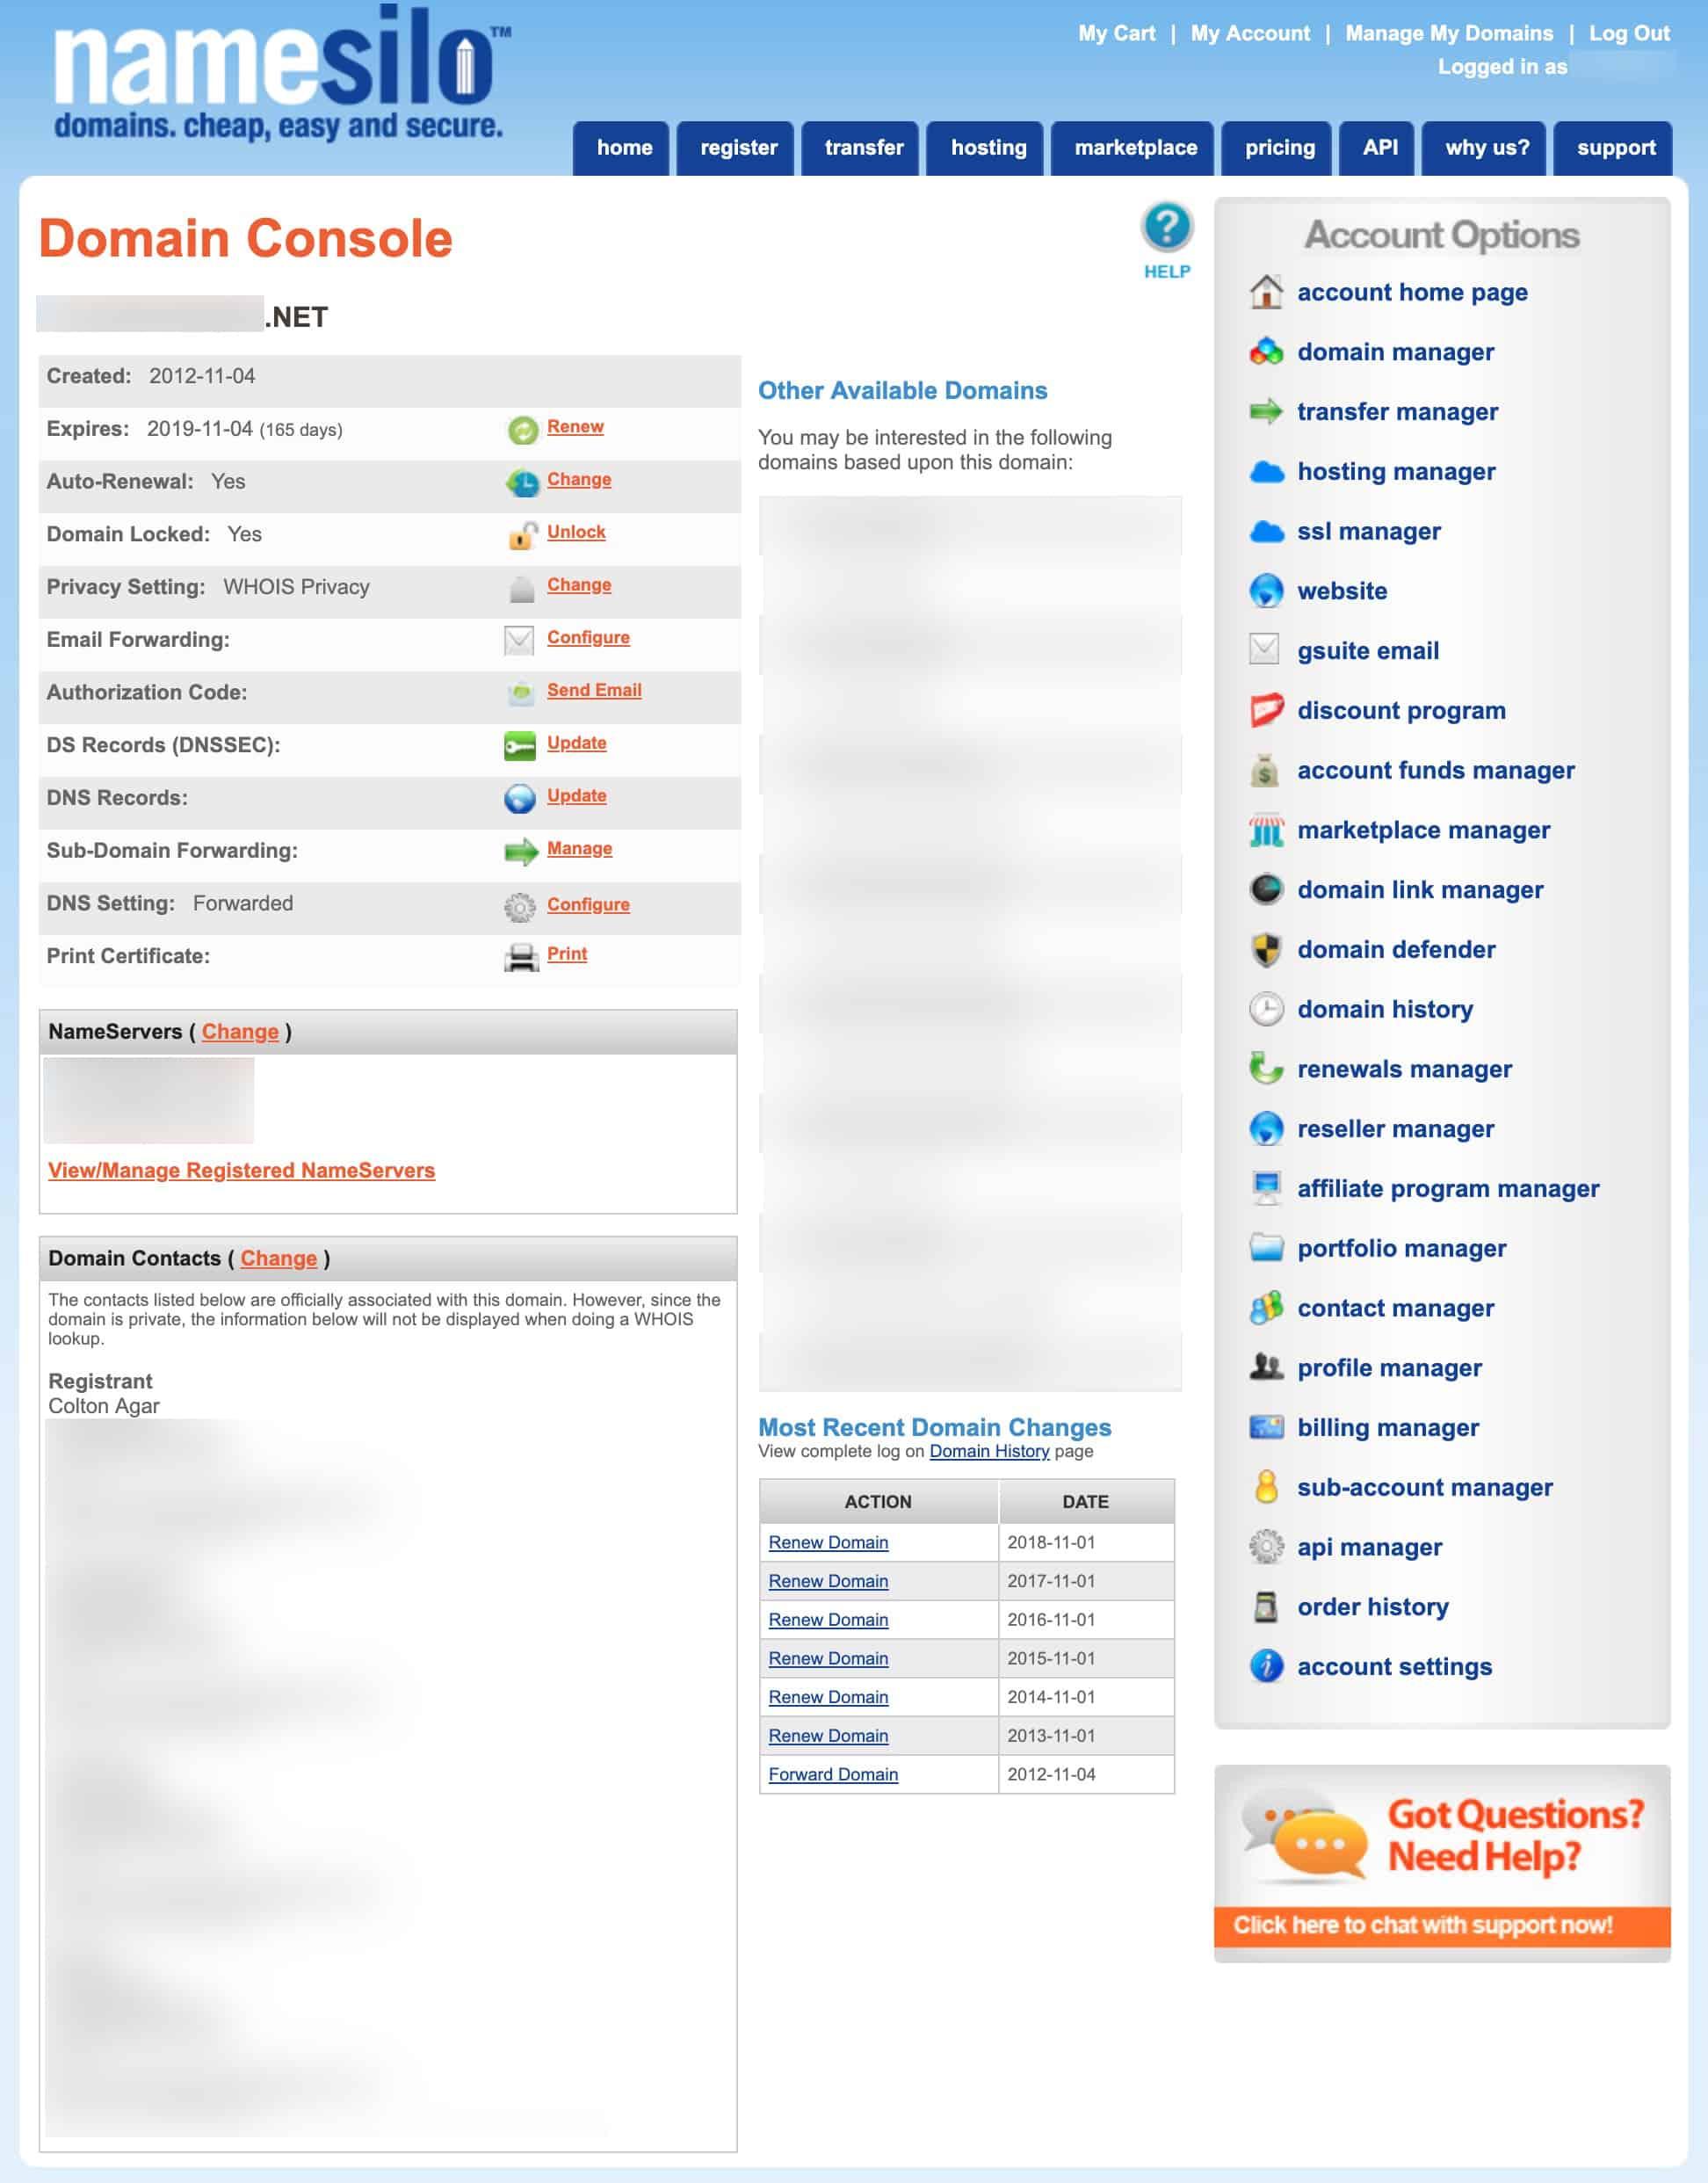 Namesilo domain console